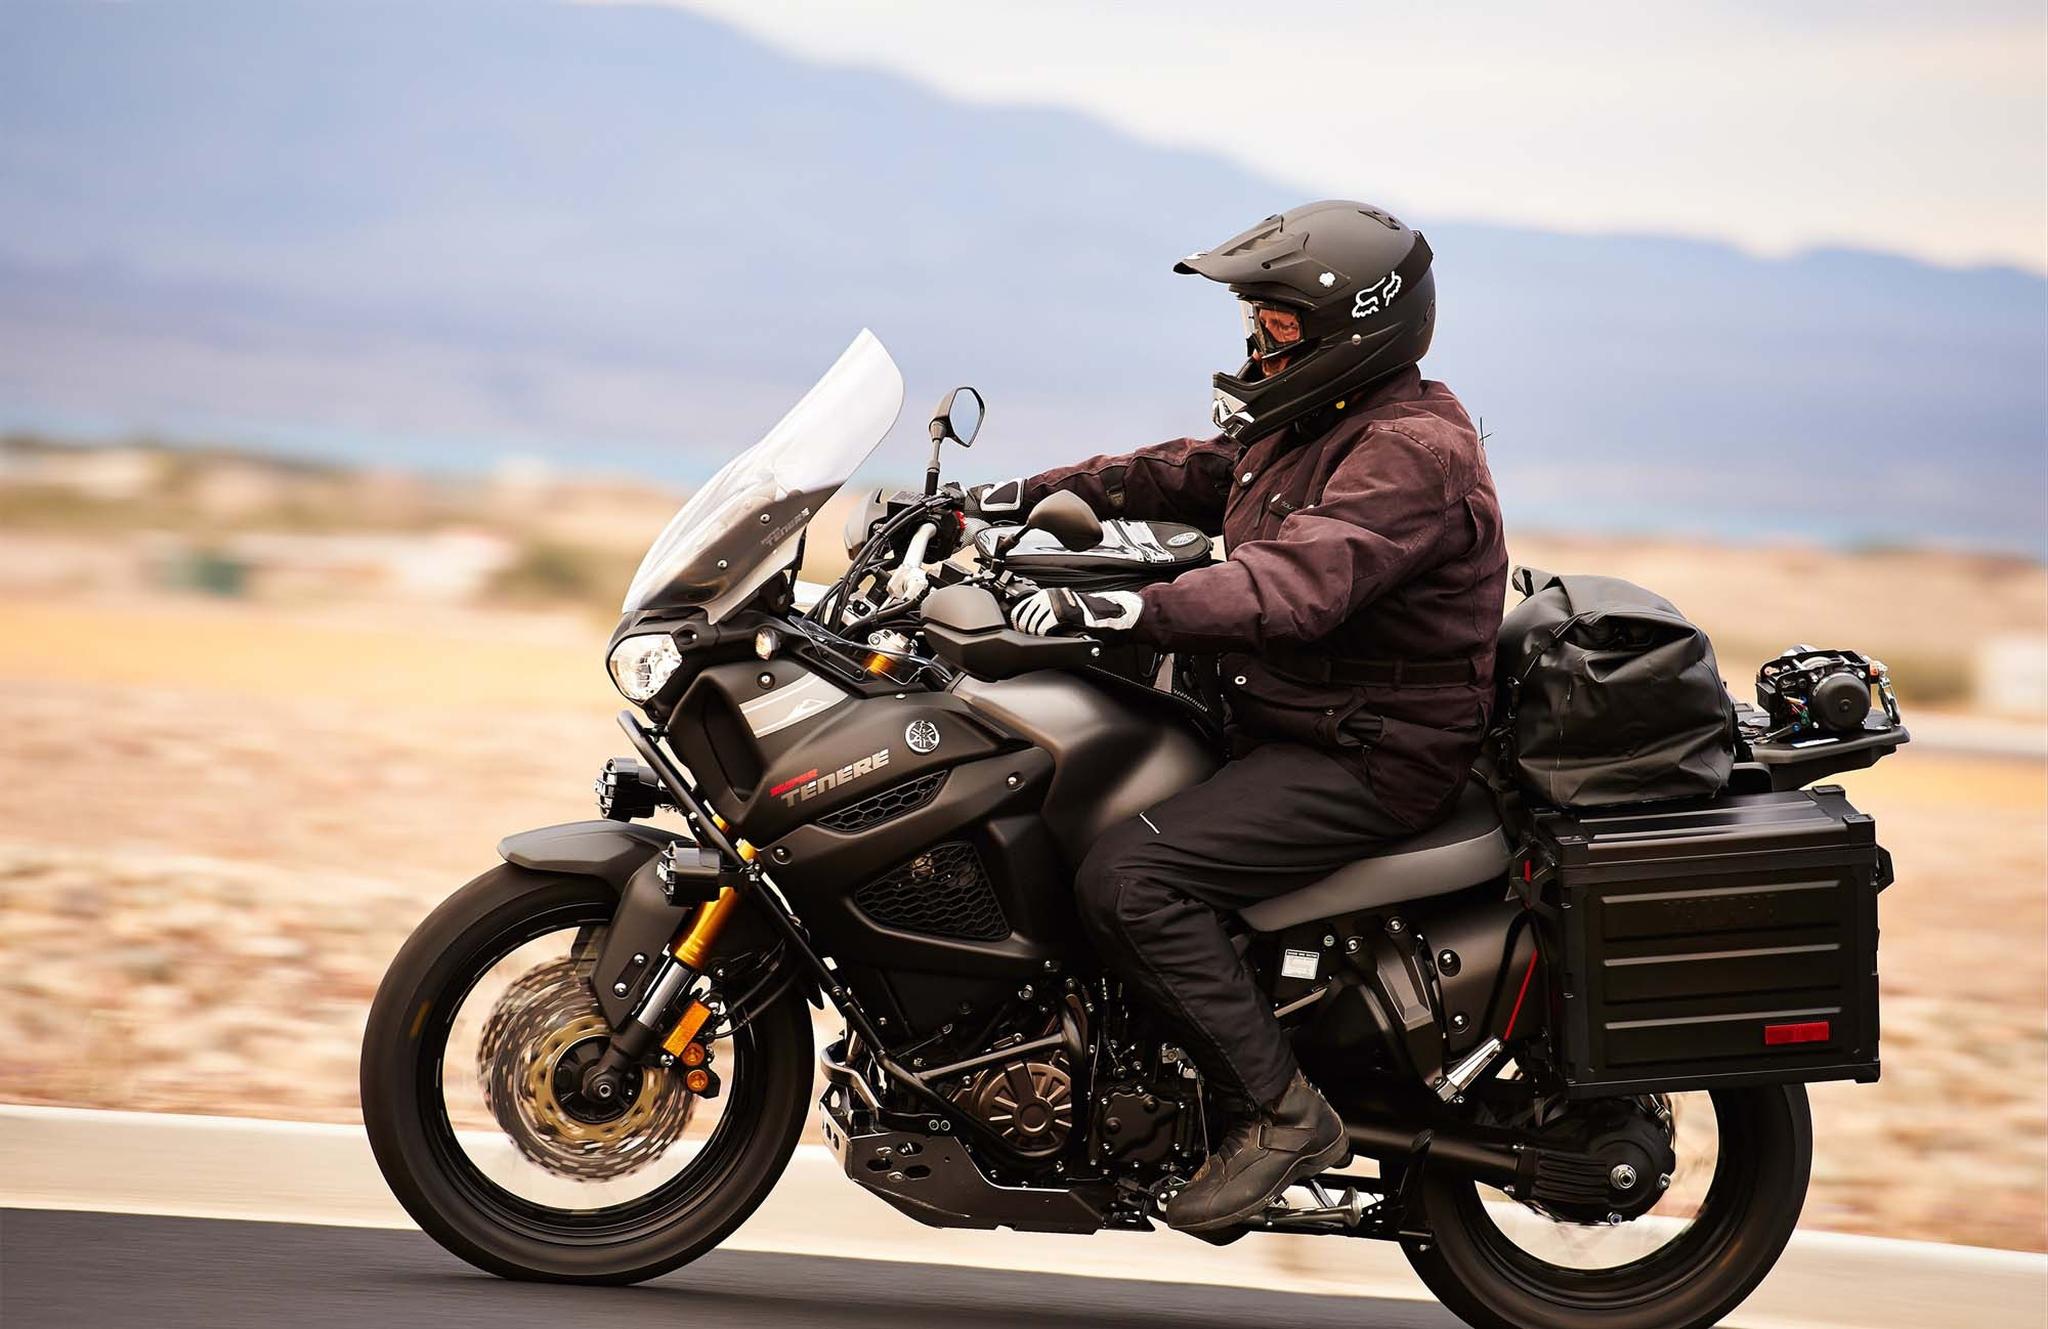 2014 Yamaha Xt1200z Super Tenere Es Arrives In The Us